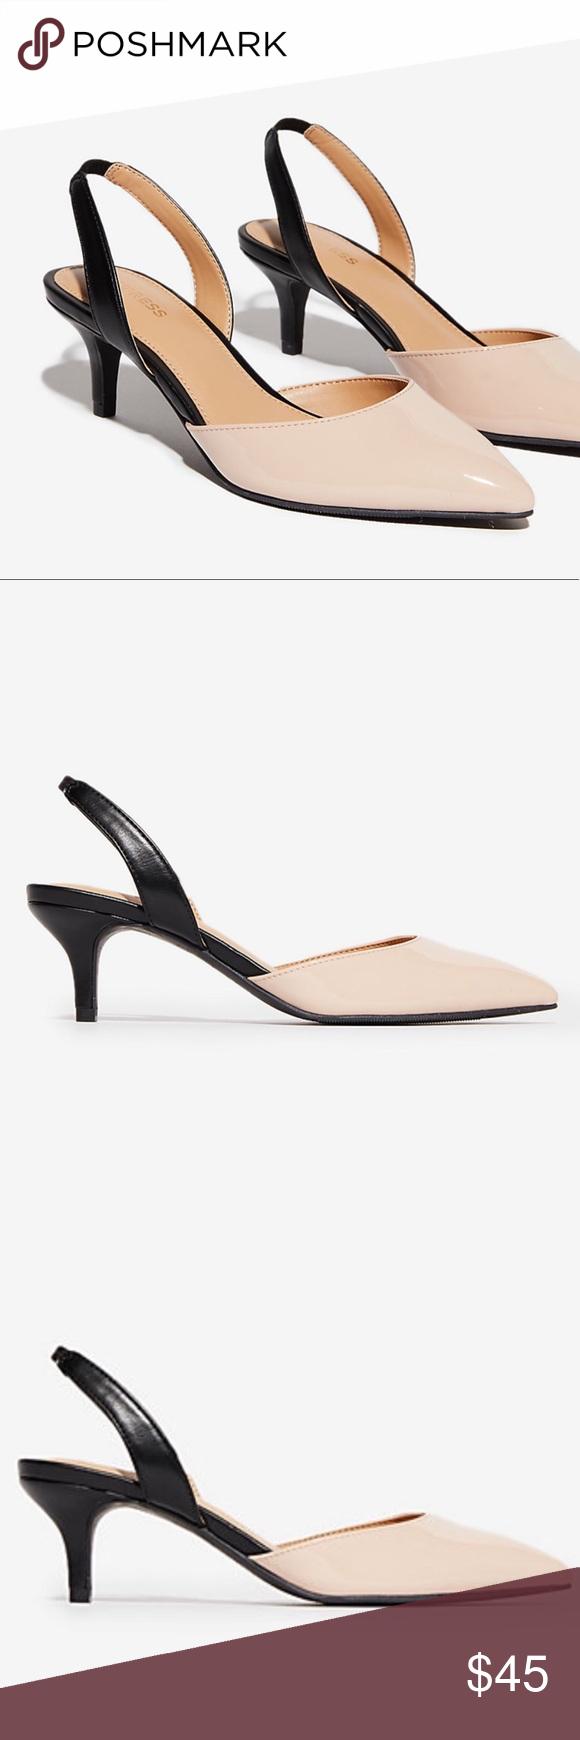 36d98283e Pointed Toe Slingback Kitten Heels Black and nude Pointed toe Open heel  Slingback strap 2 1/4